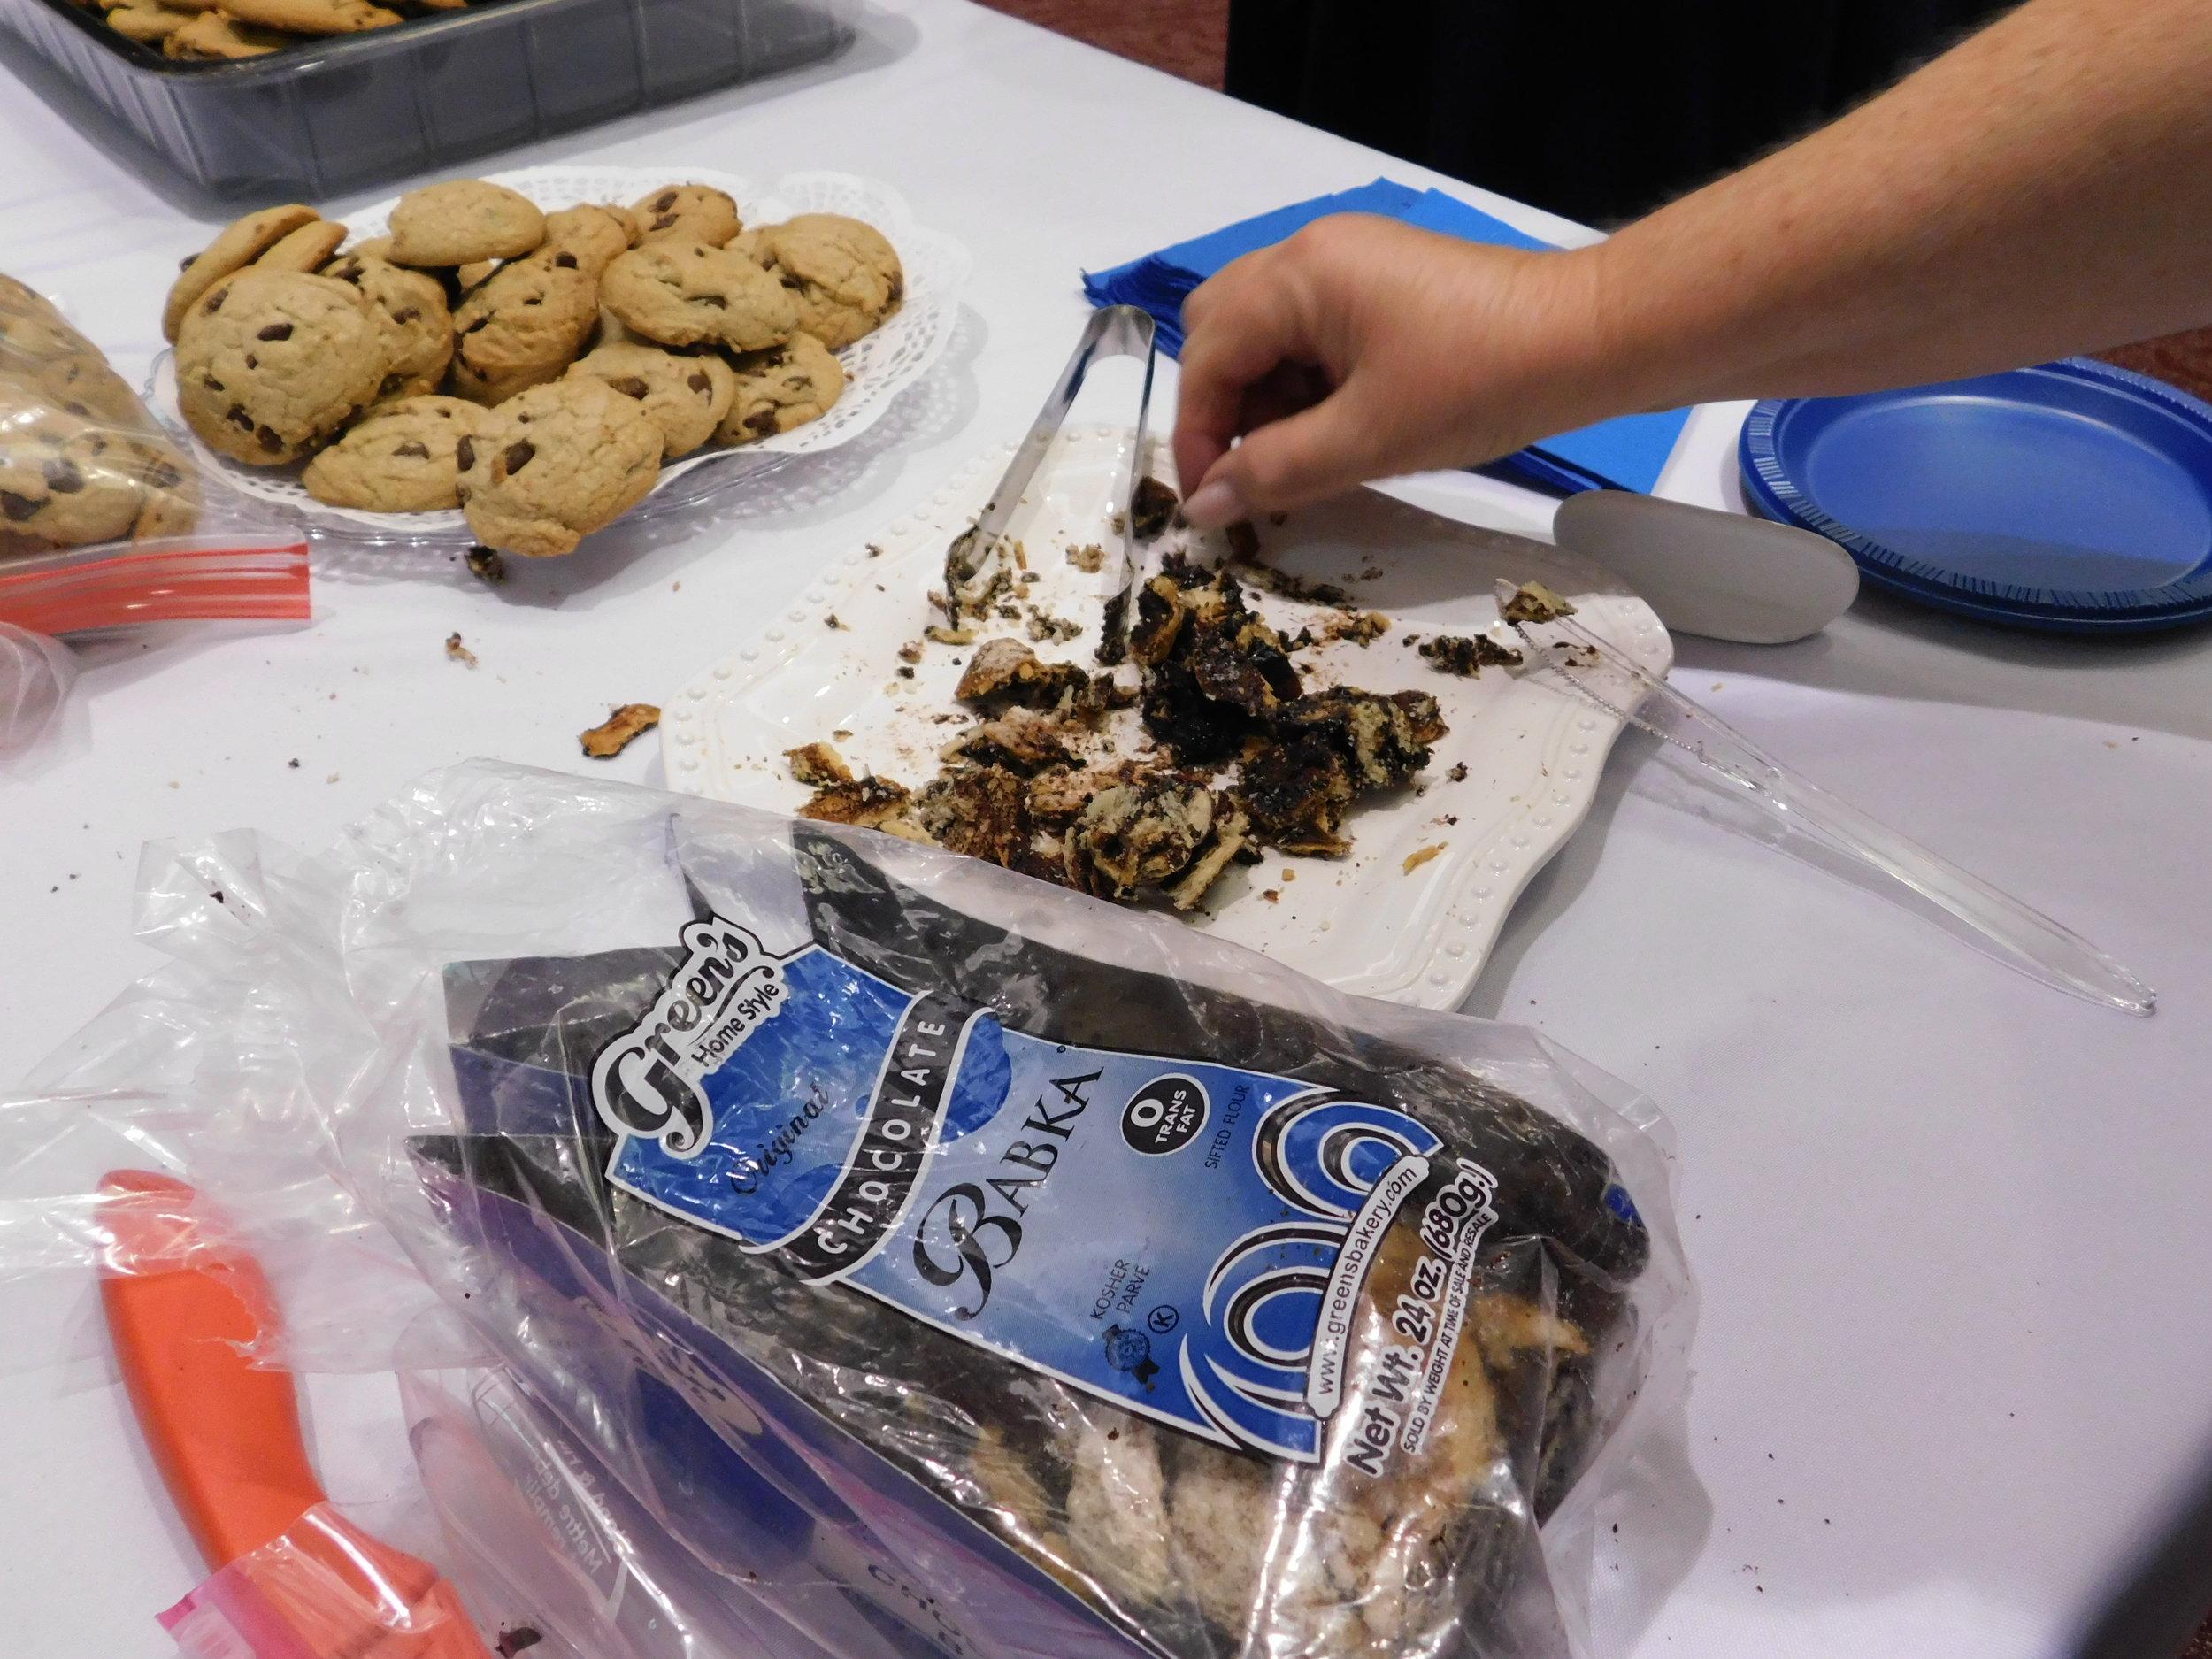 Everyone had a taste of Shmuel's favorite dessert, Chocolate Babka